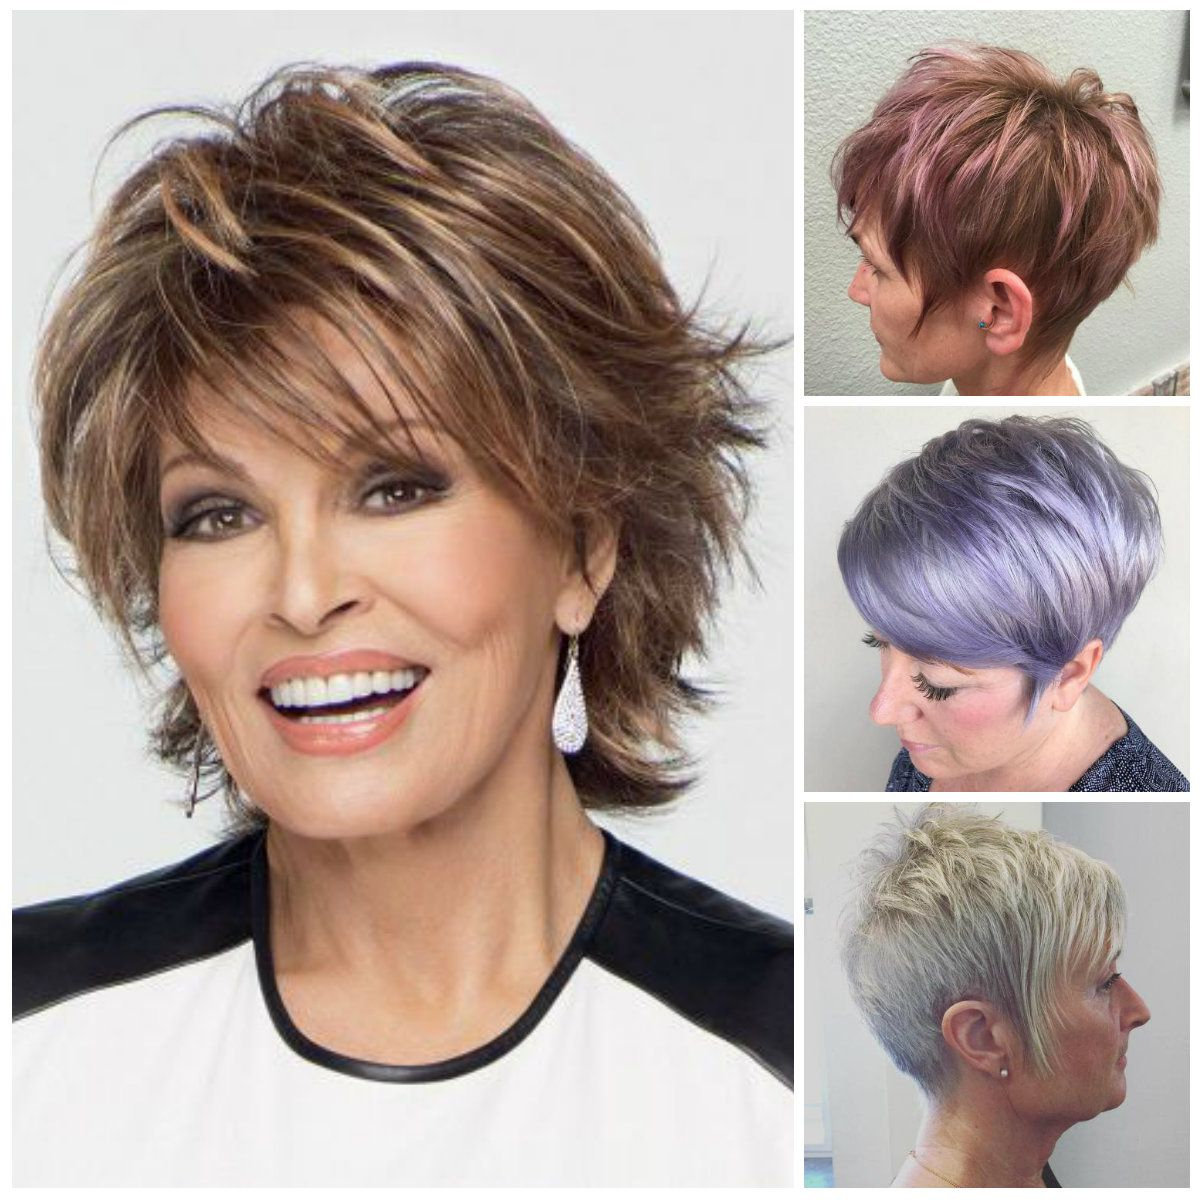 Face Framing Short Haircuts | Framecreave (View 4 of 25)